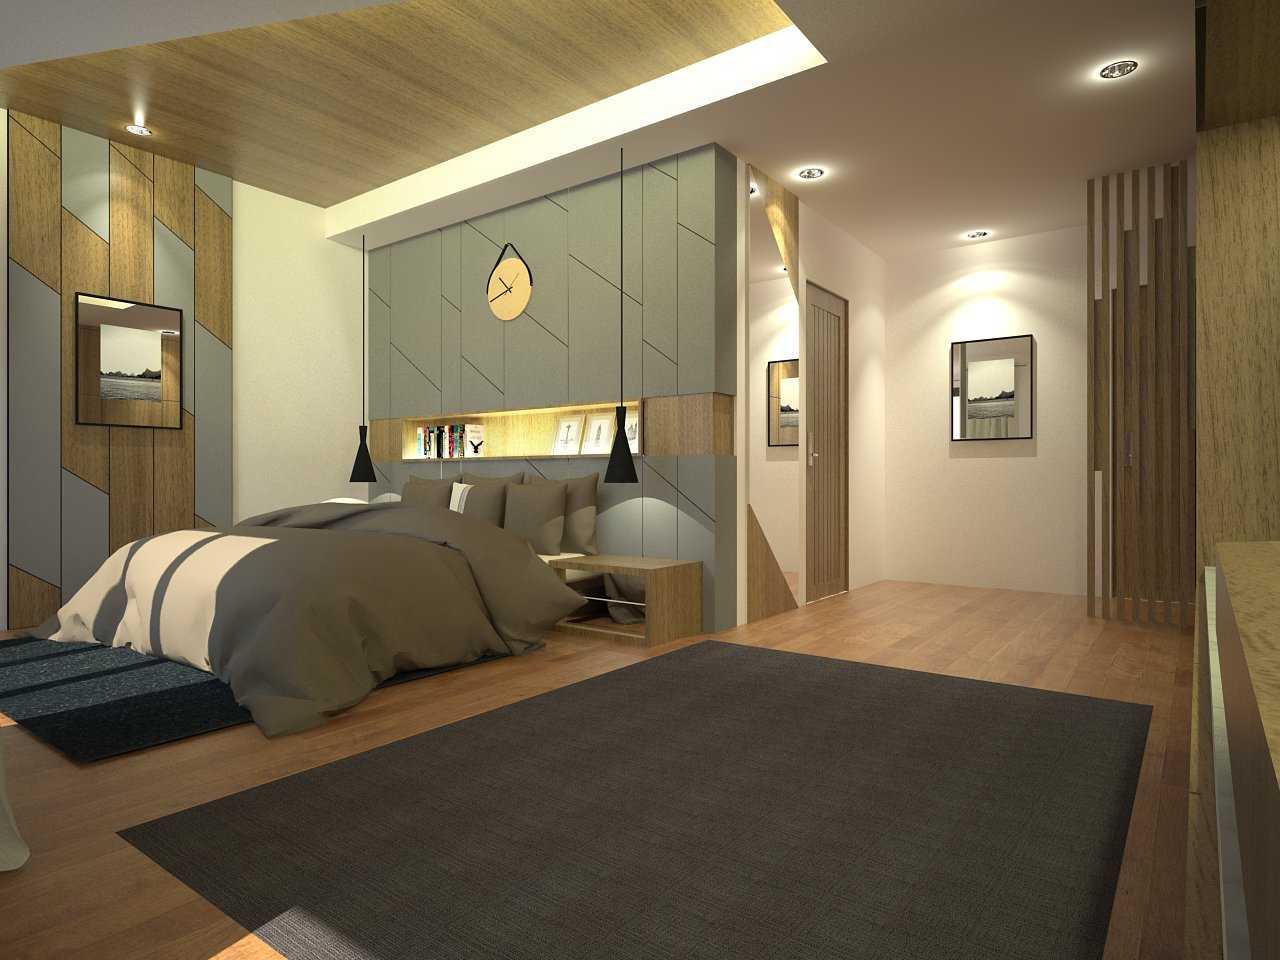 Zigzag Architecture Studio Pulomas House Daerah Khusus Ibukota Jakarta, Indonesia  Masterbed-R2-View01  37598